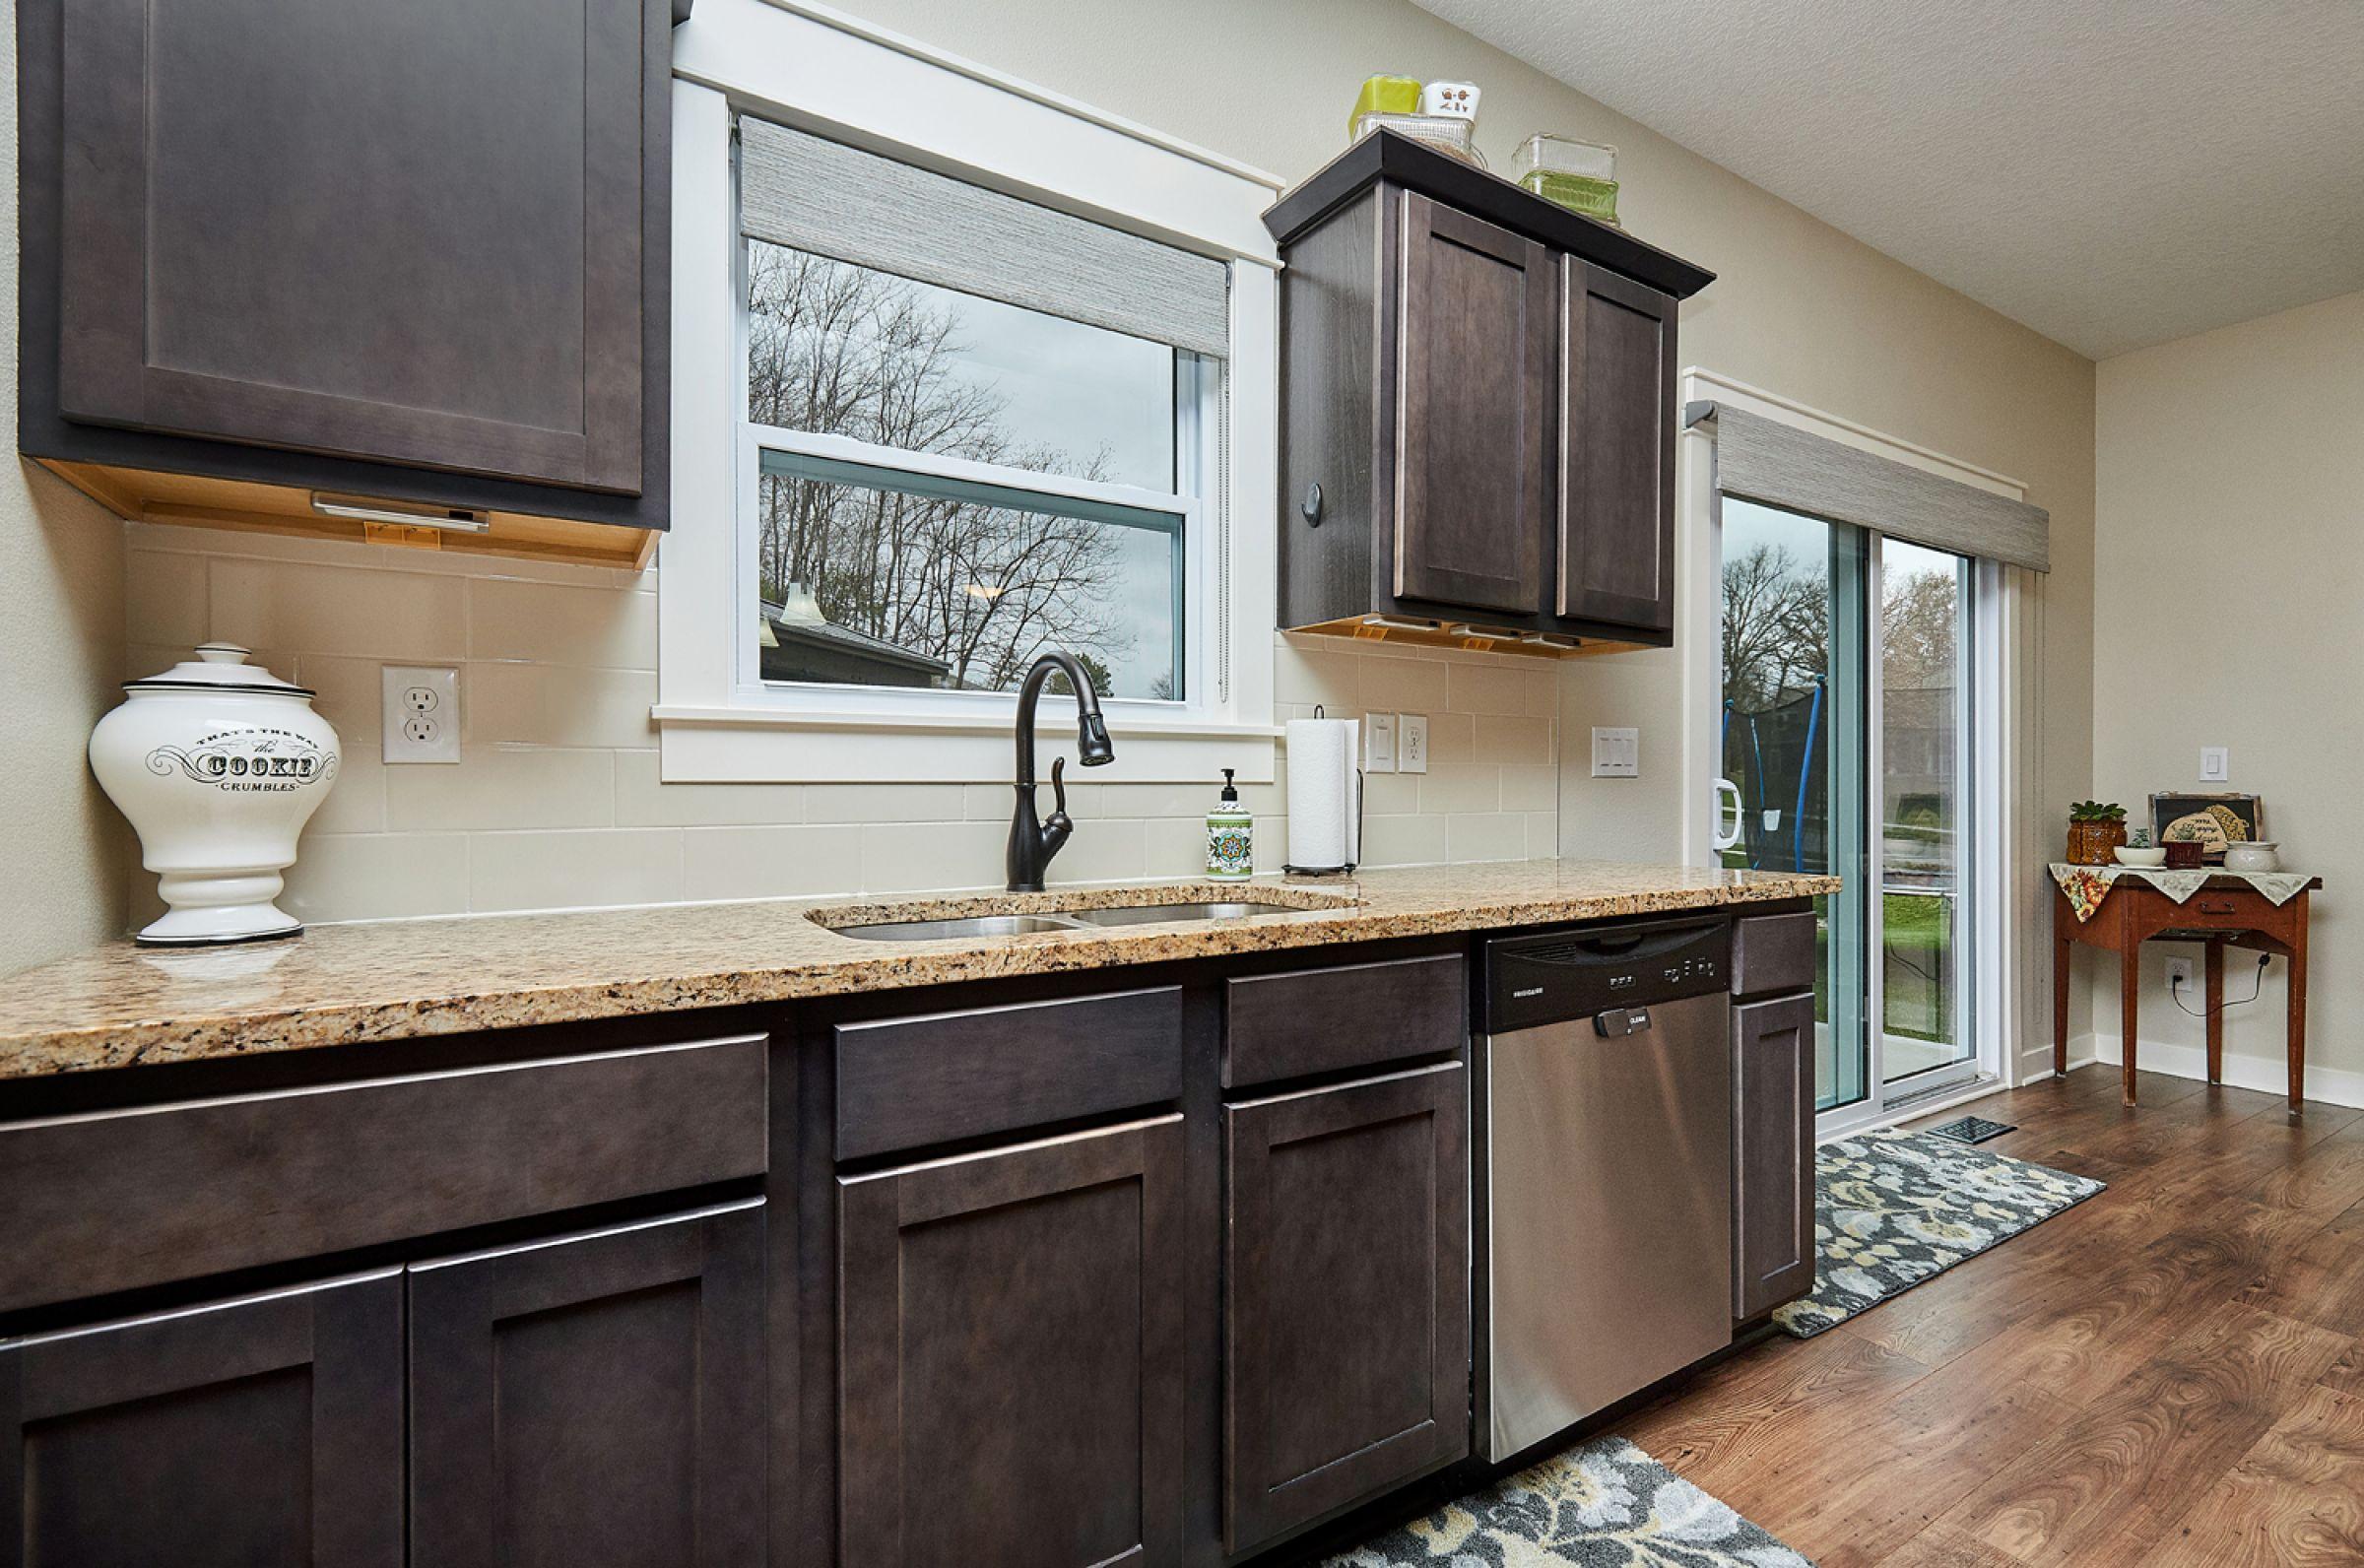 residential-warren-county-iowa-1-acres-listing-number-15254-17-2020-11-11-165831.jpg